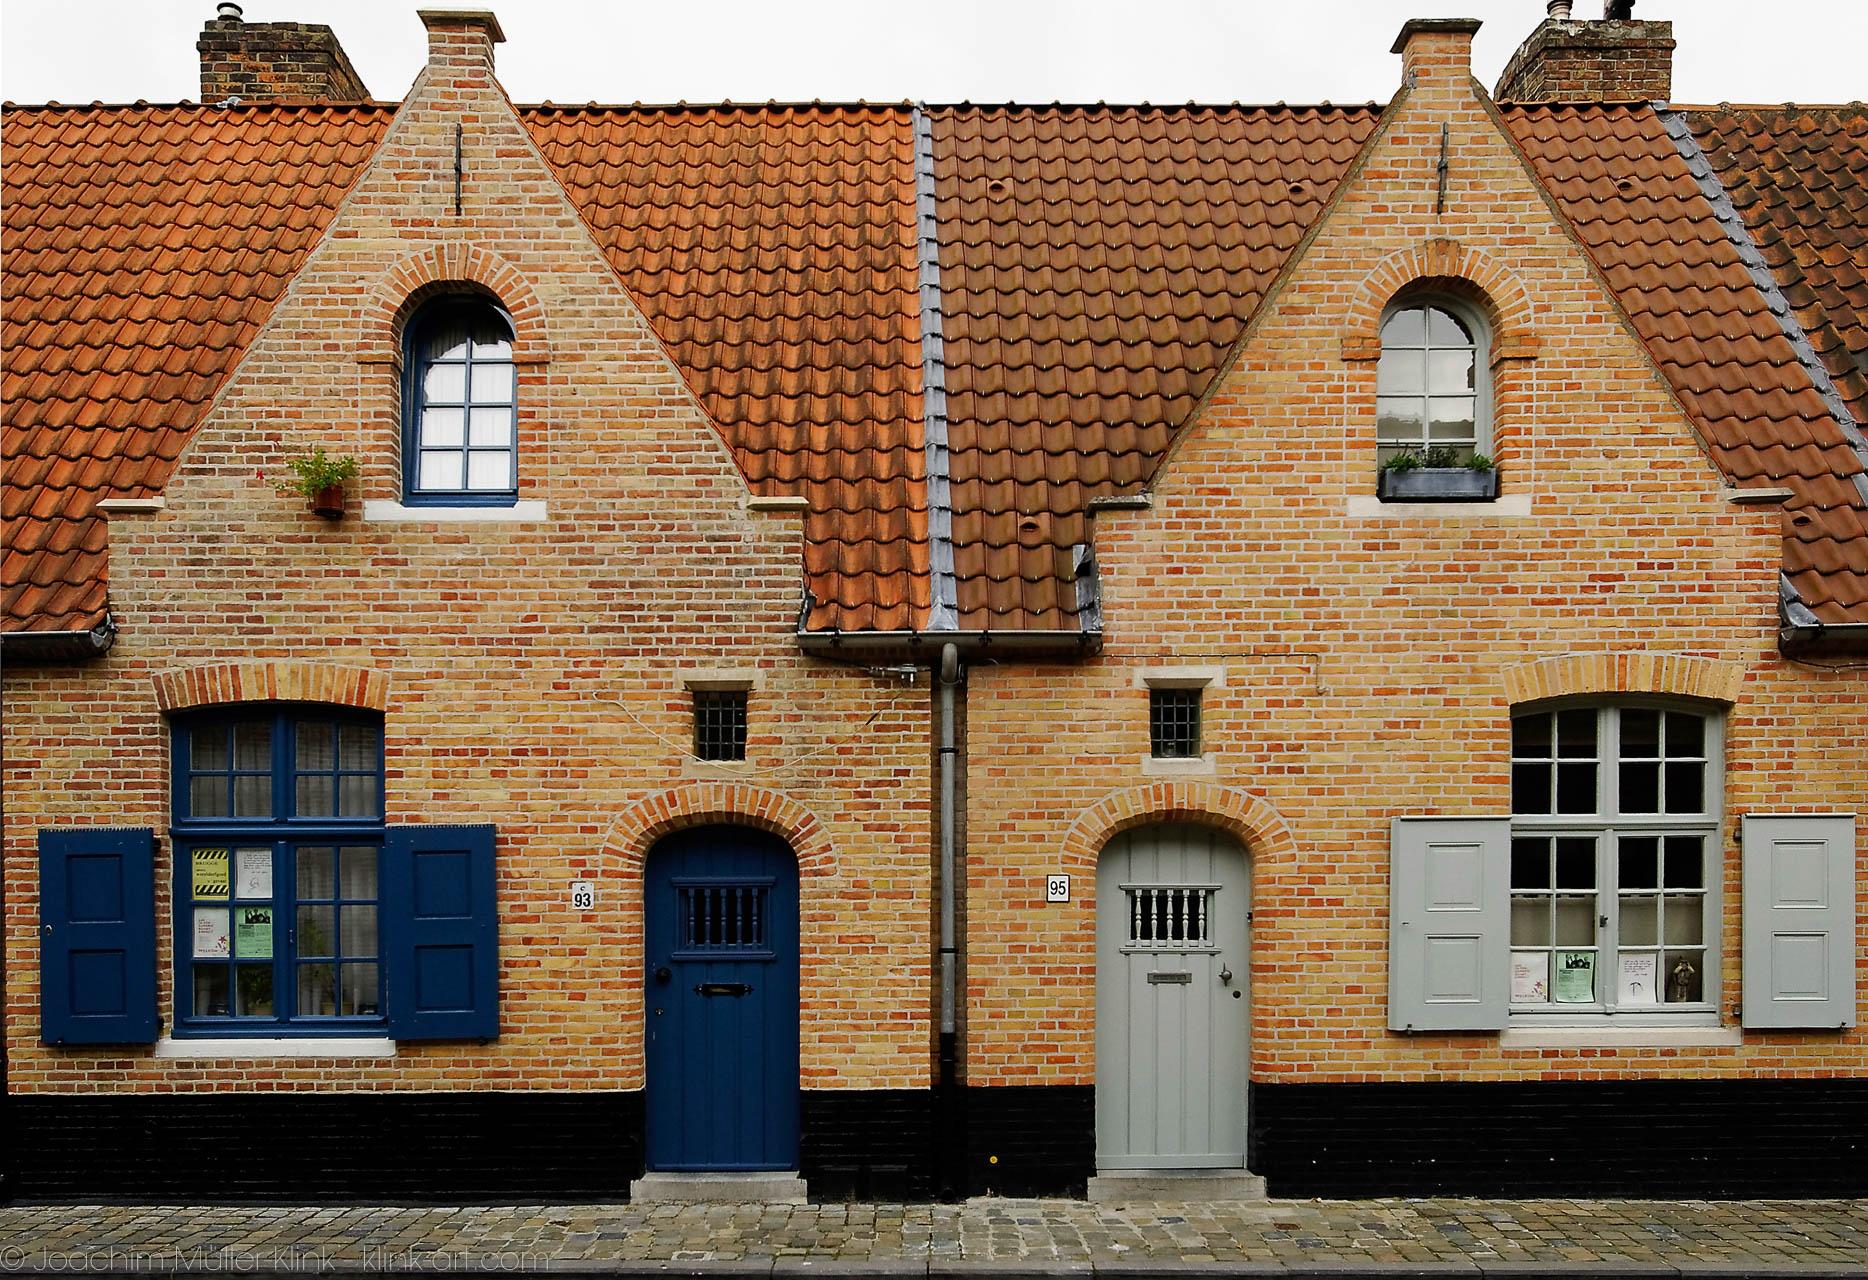 Doppelhaus aus roten Backsteinen - Double House made out of red bricks